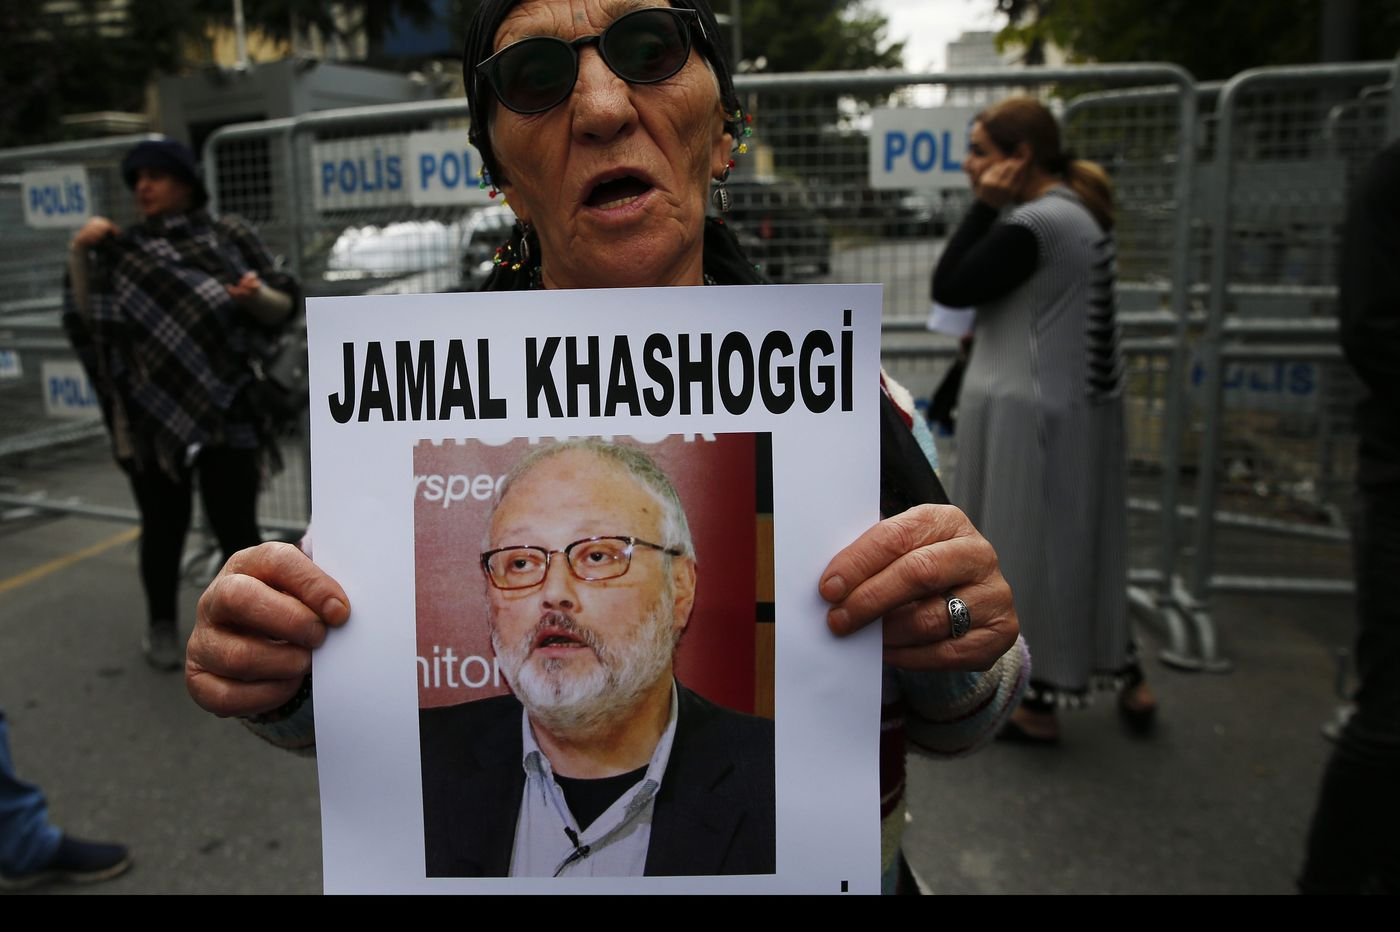 Jamal Khashoggi affair highlights what happens when America abdicates role as free press defender   Trudy Rubin